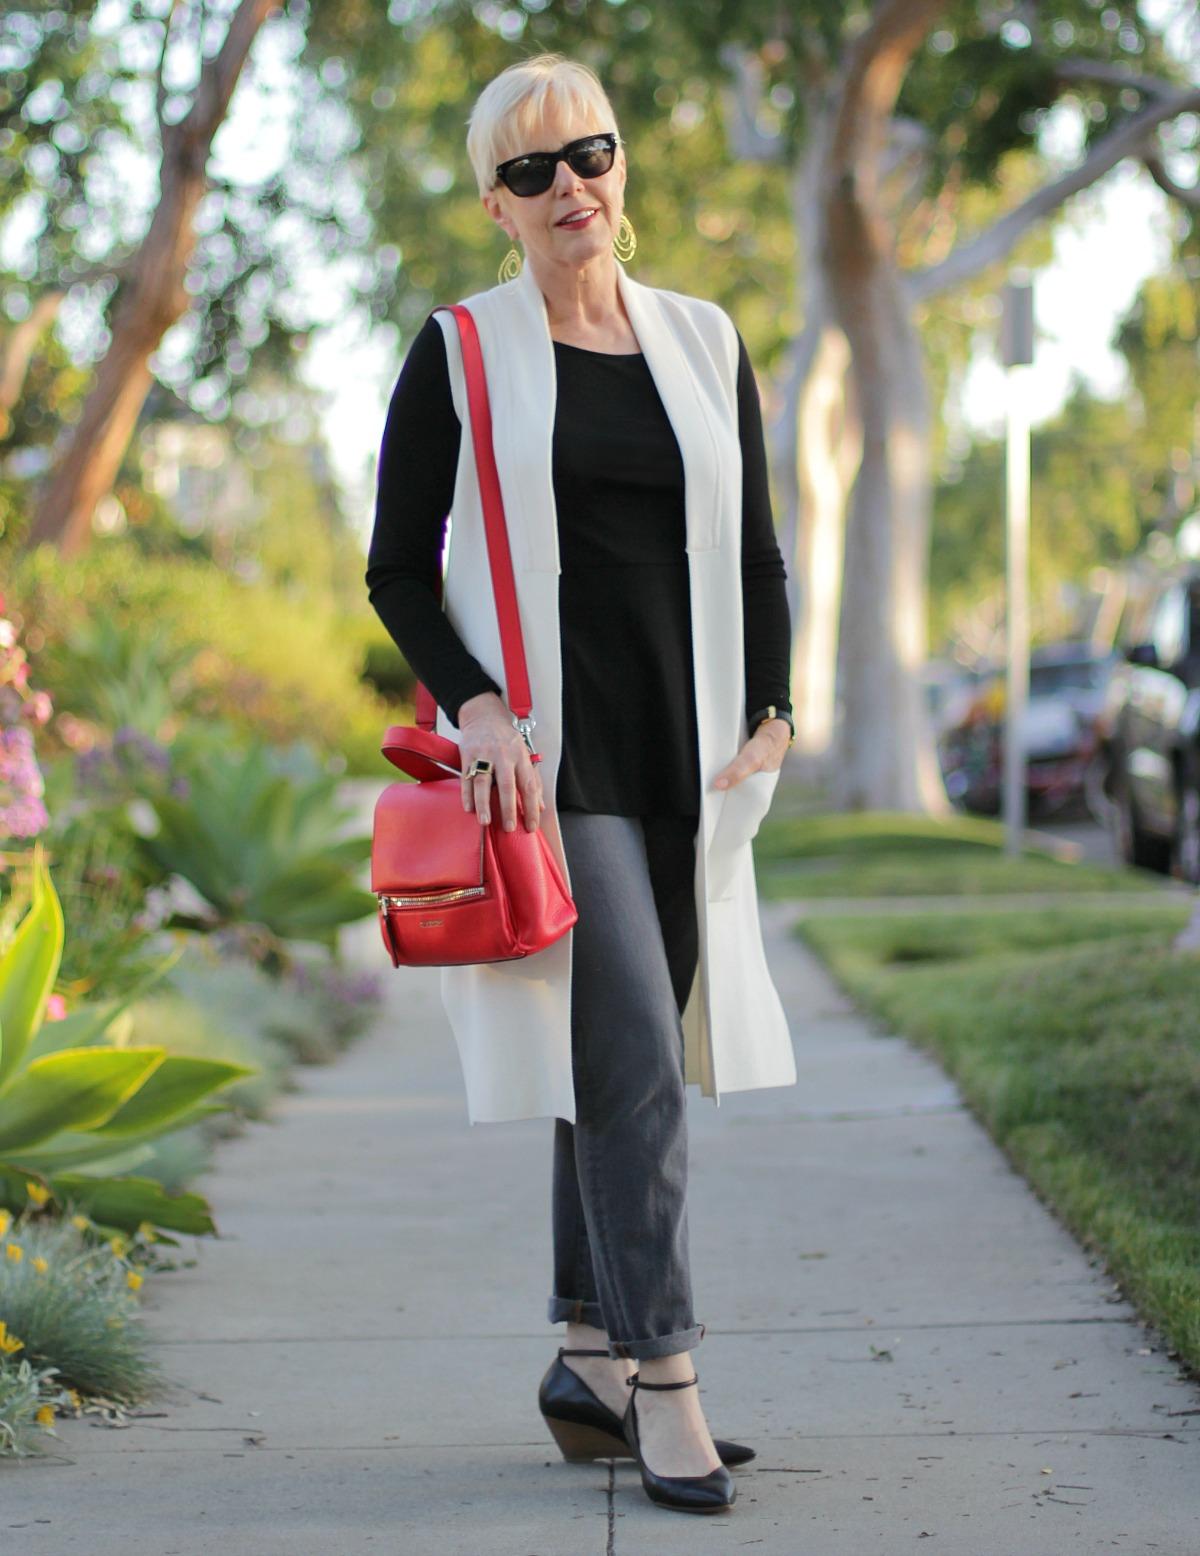 Givenchy Pandora bag, long knit vest